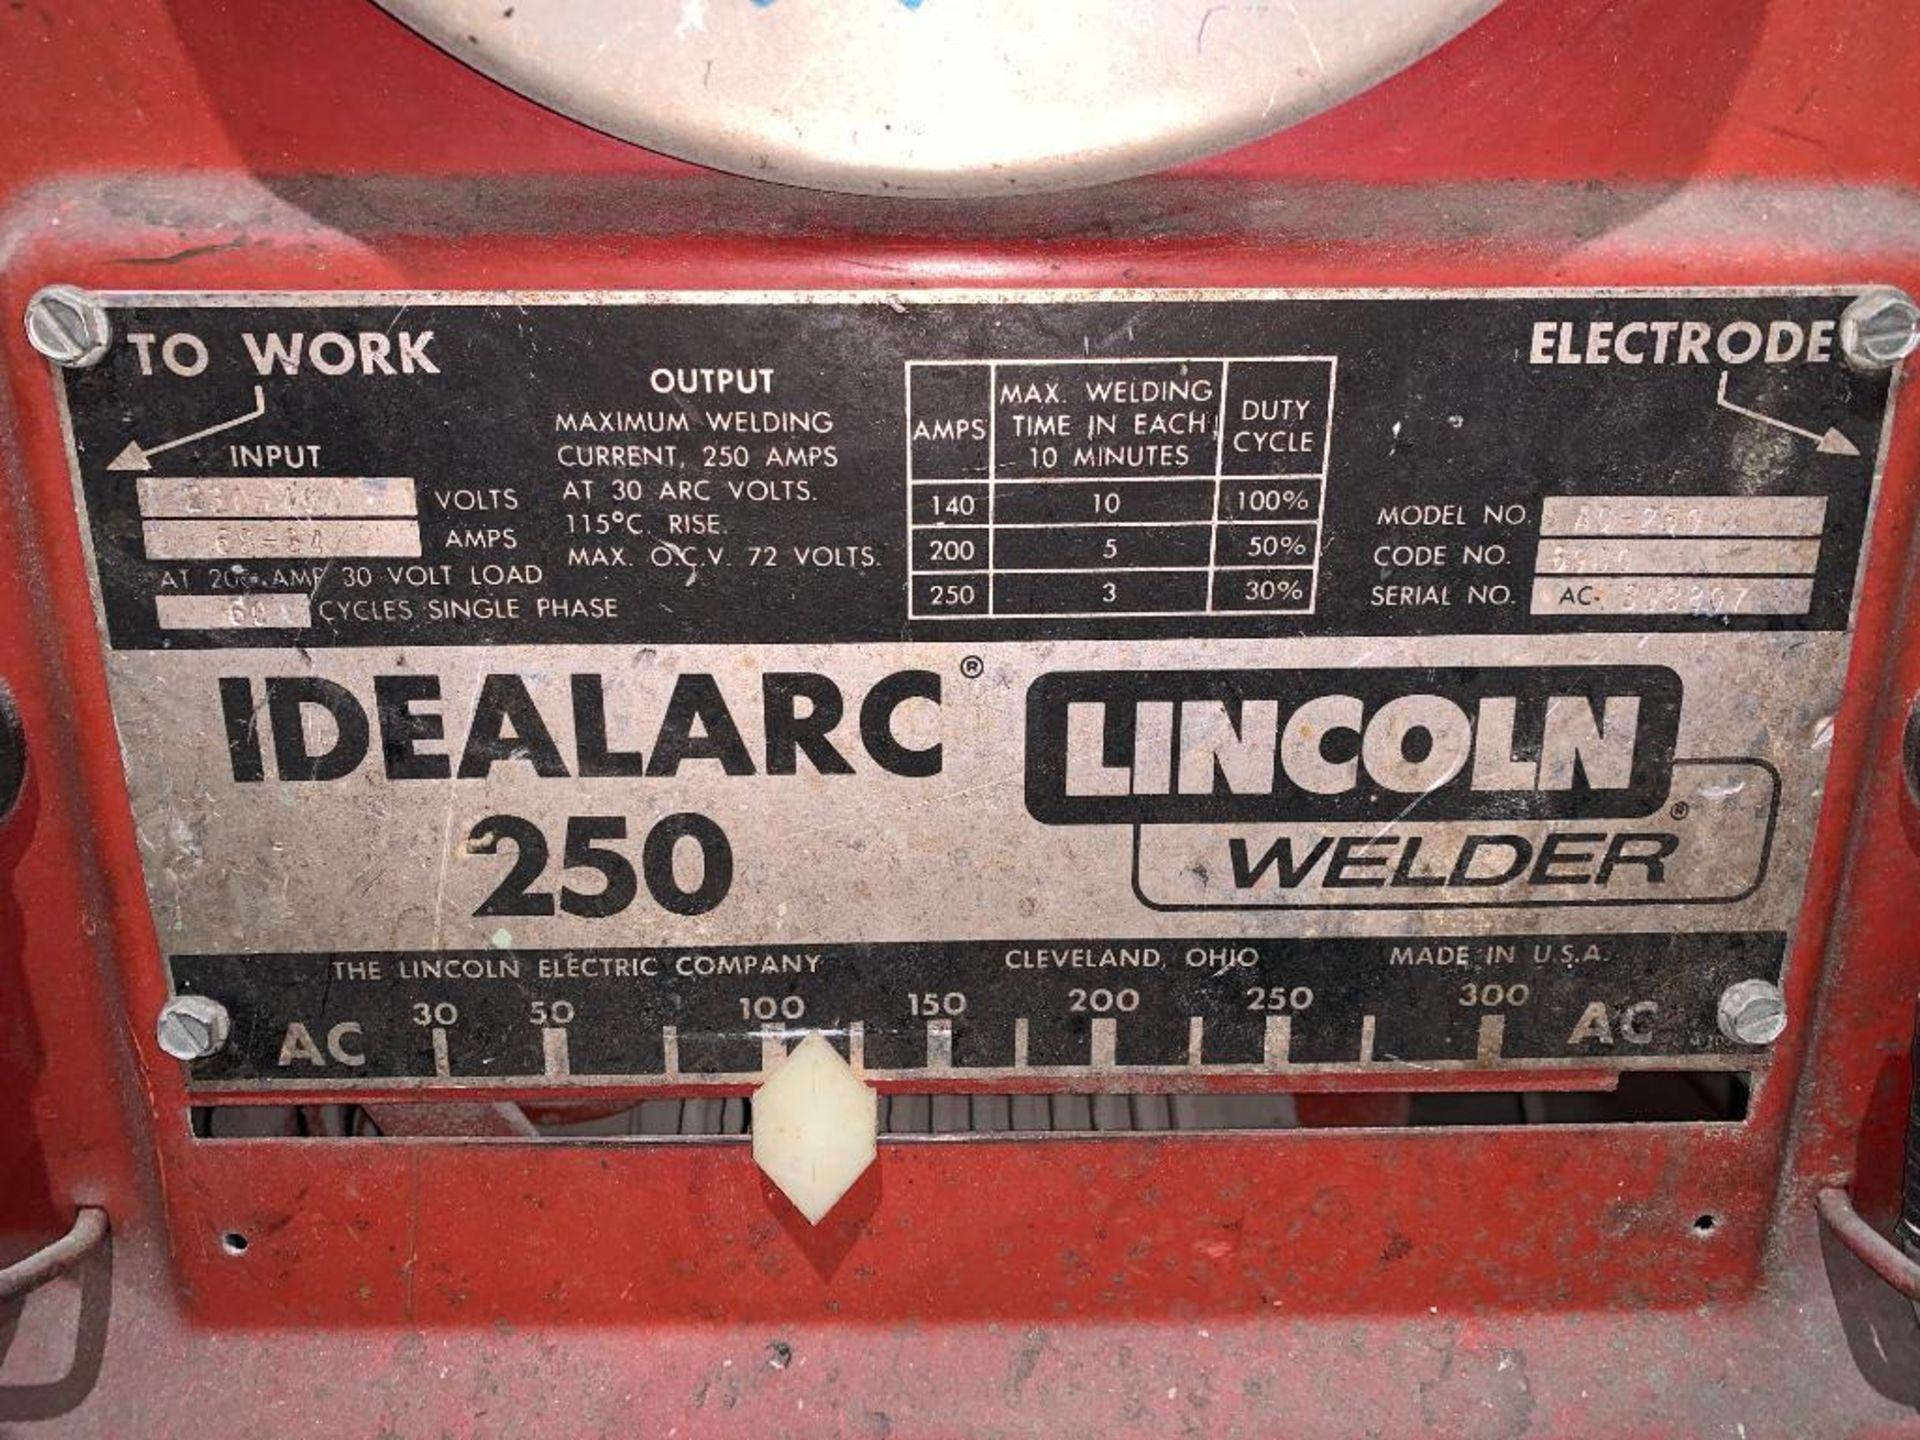 Lincoln Idealarc 250 stick welder - Image 2 of 8